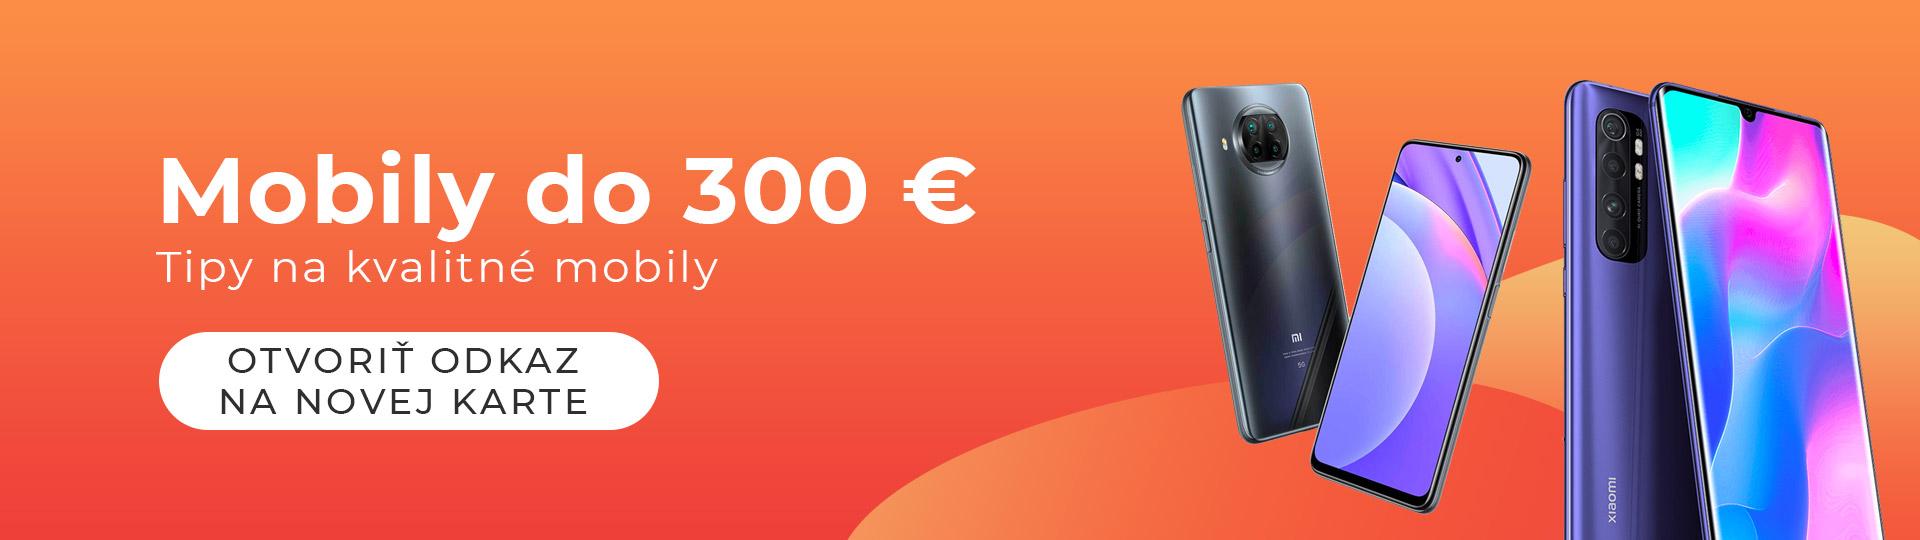 Mobily do 300 eur